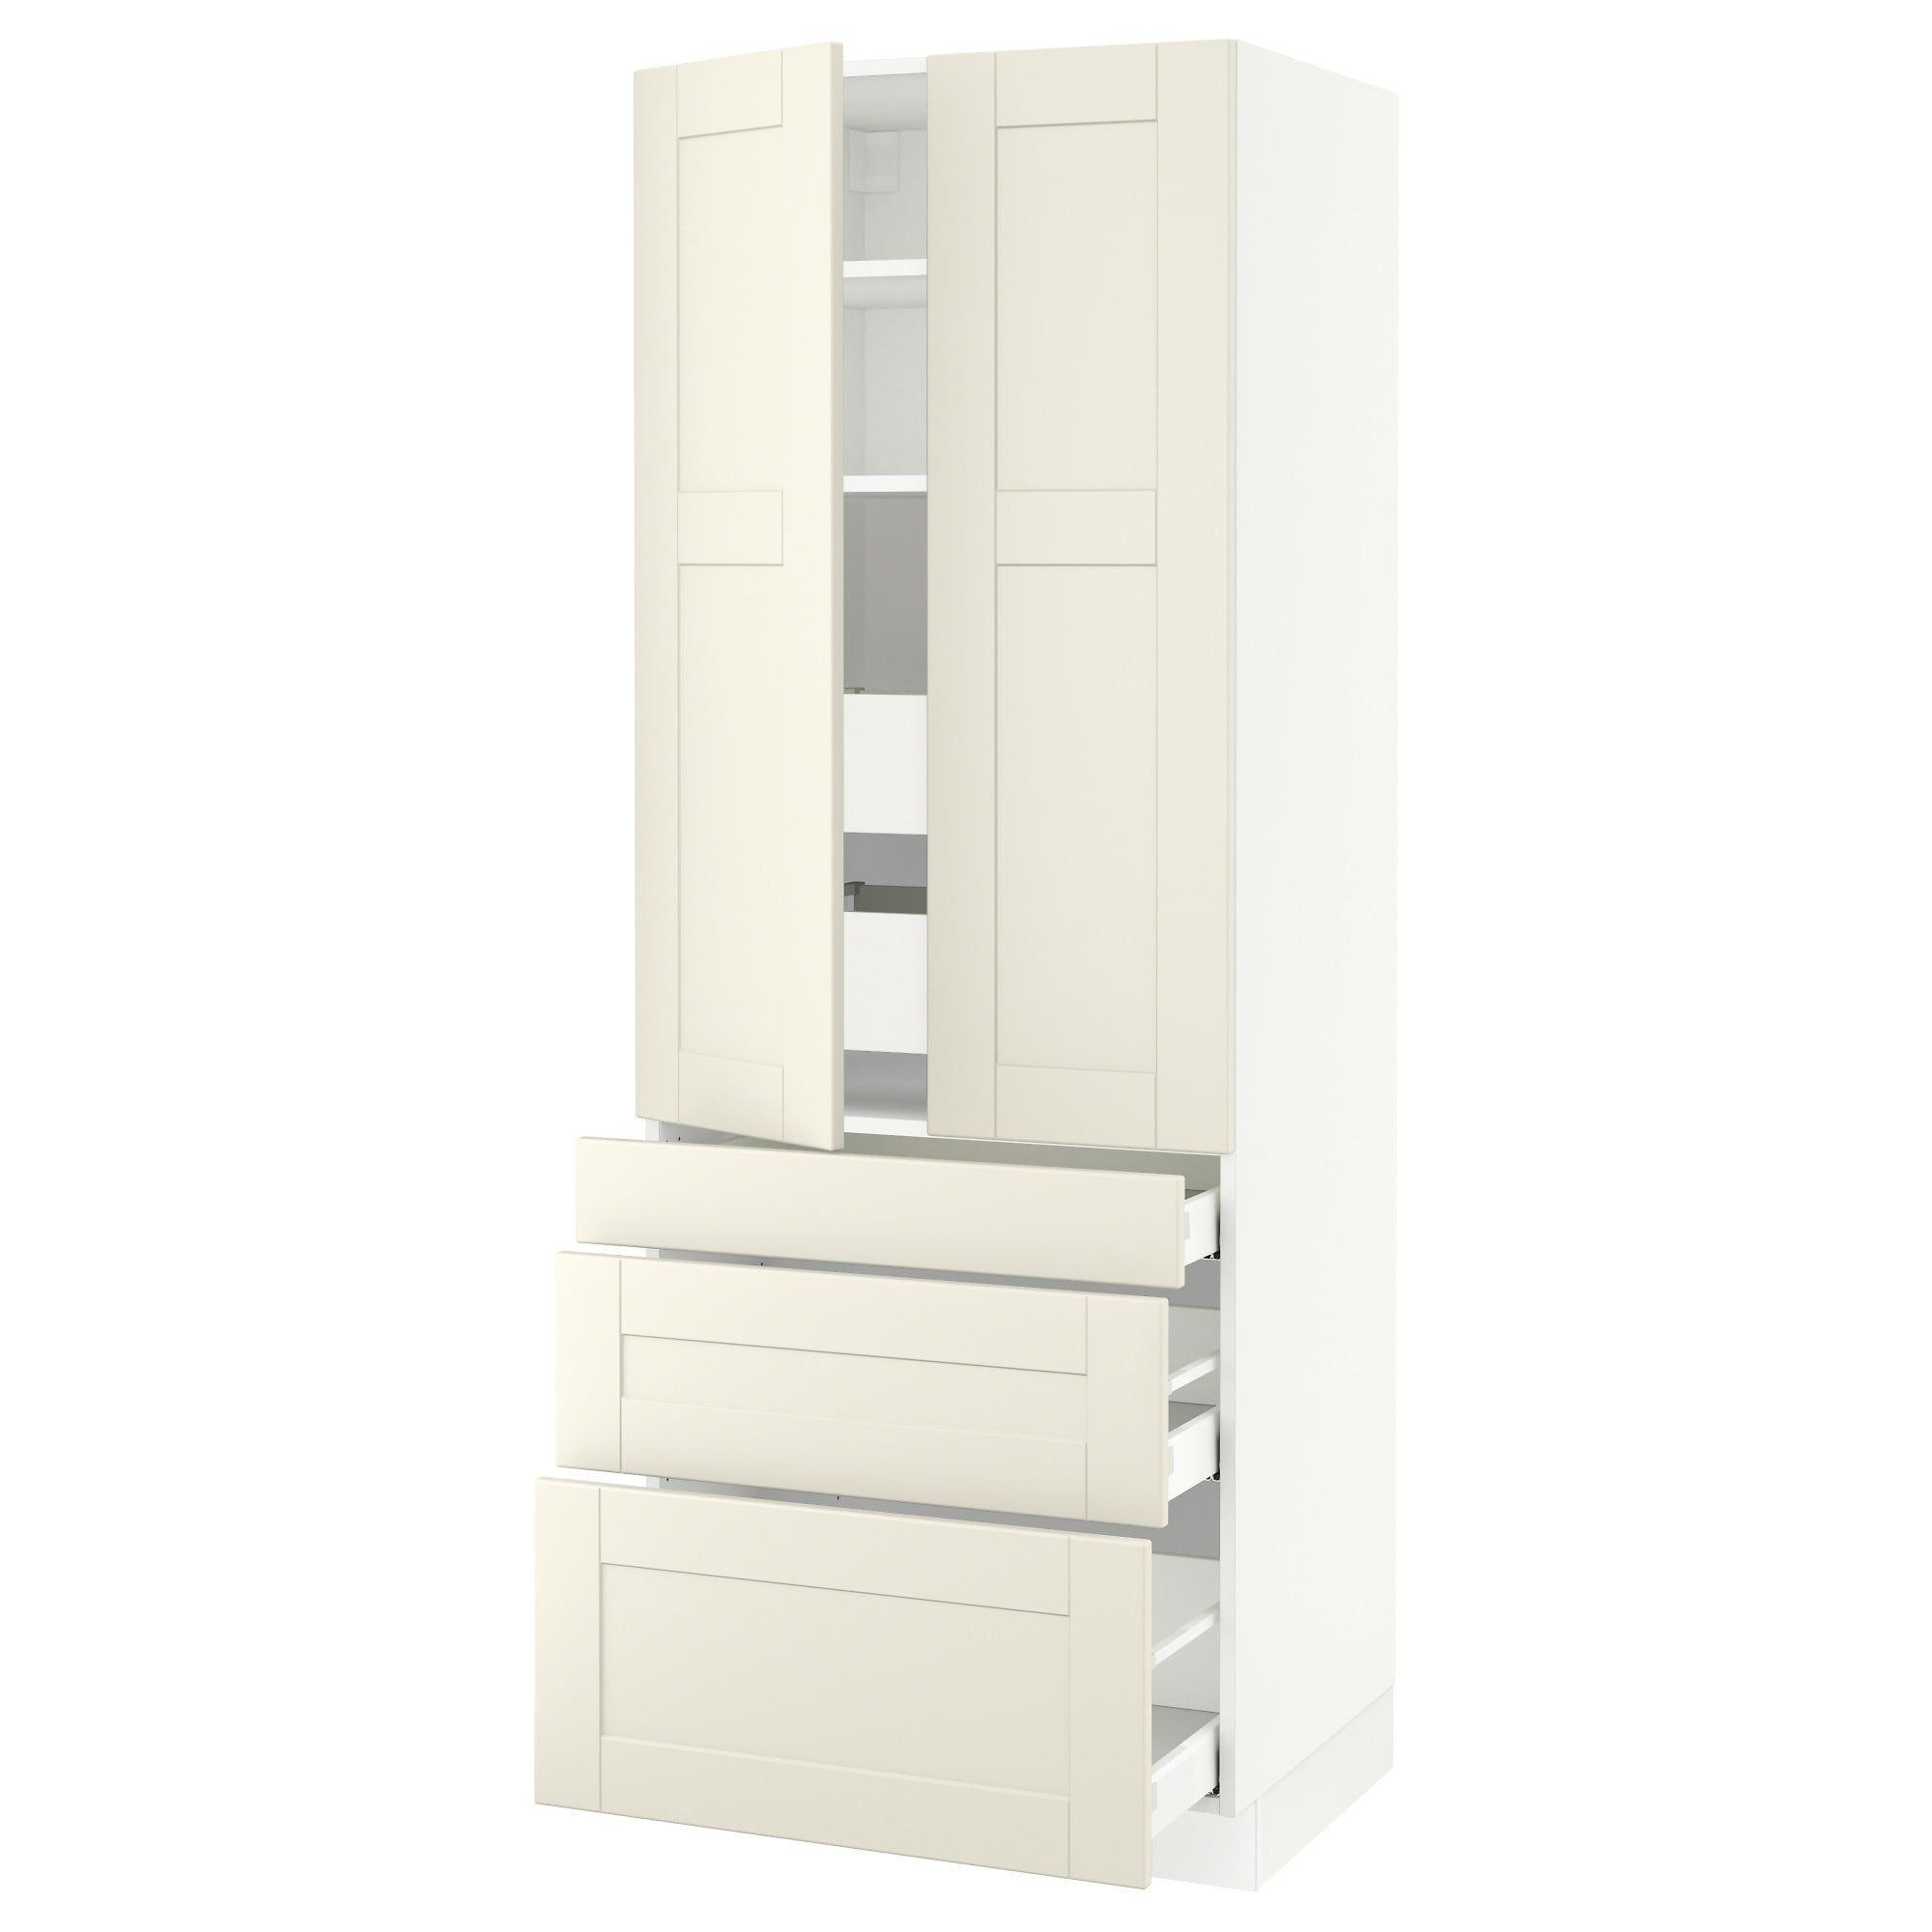 Ikea sektion white high cabinet w doors u drawers frame colour